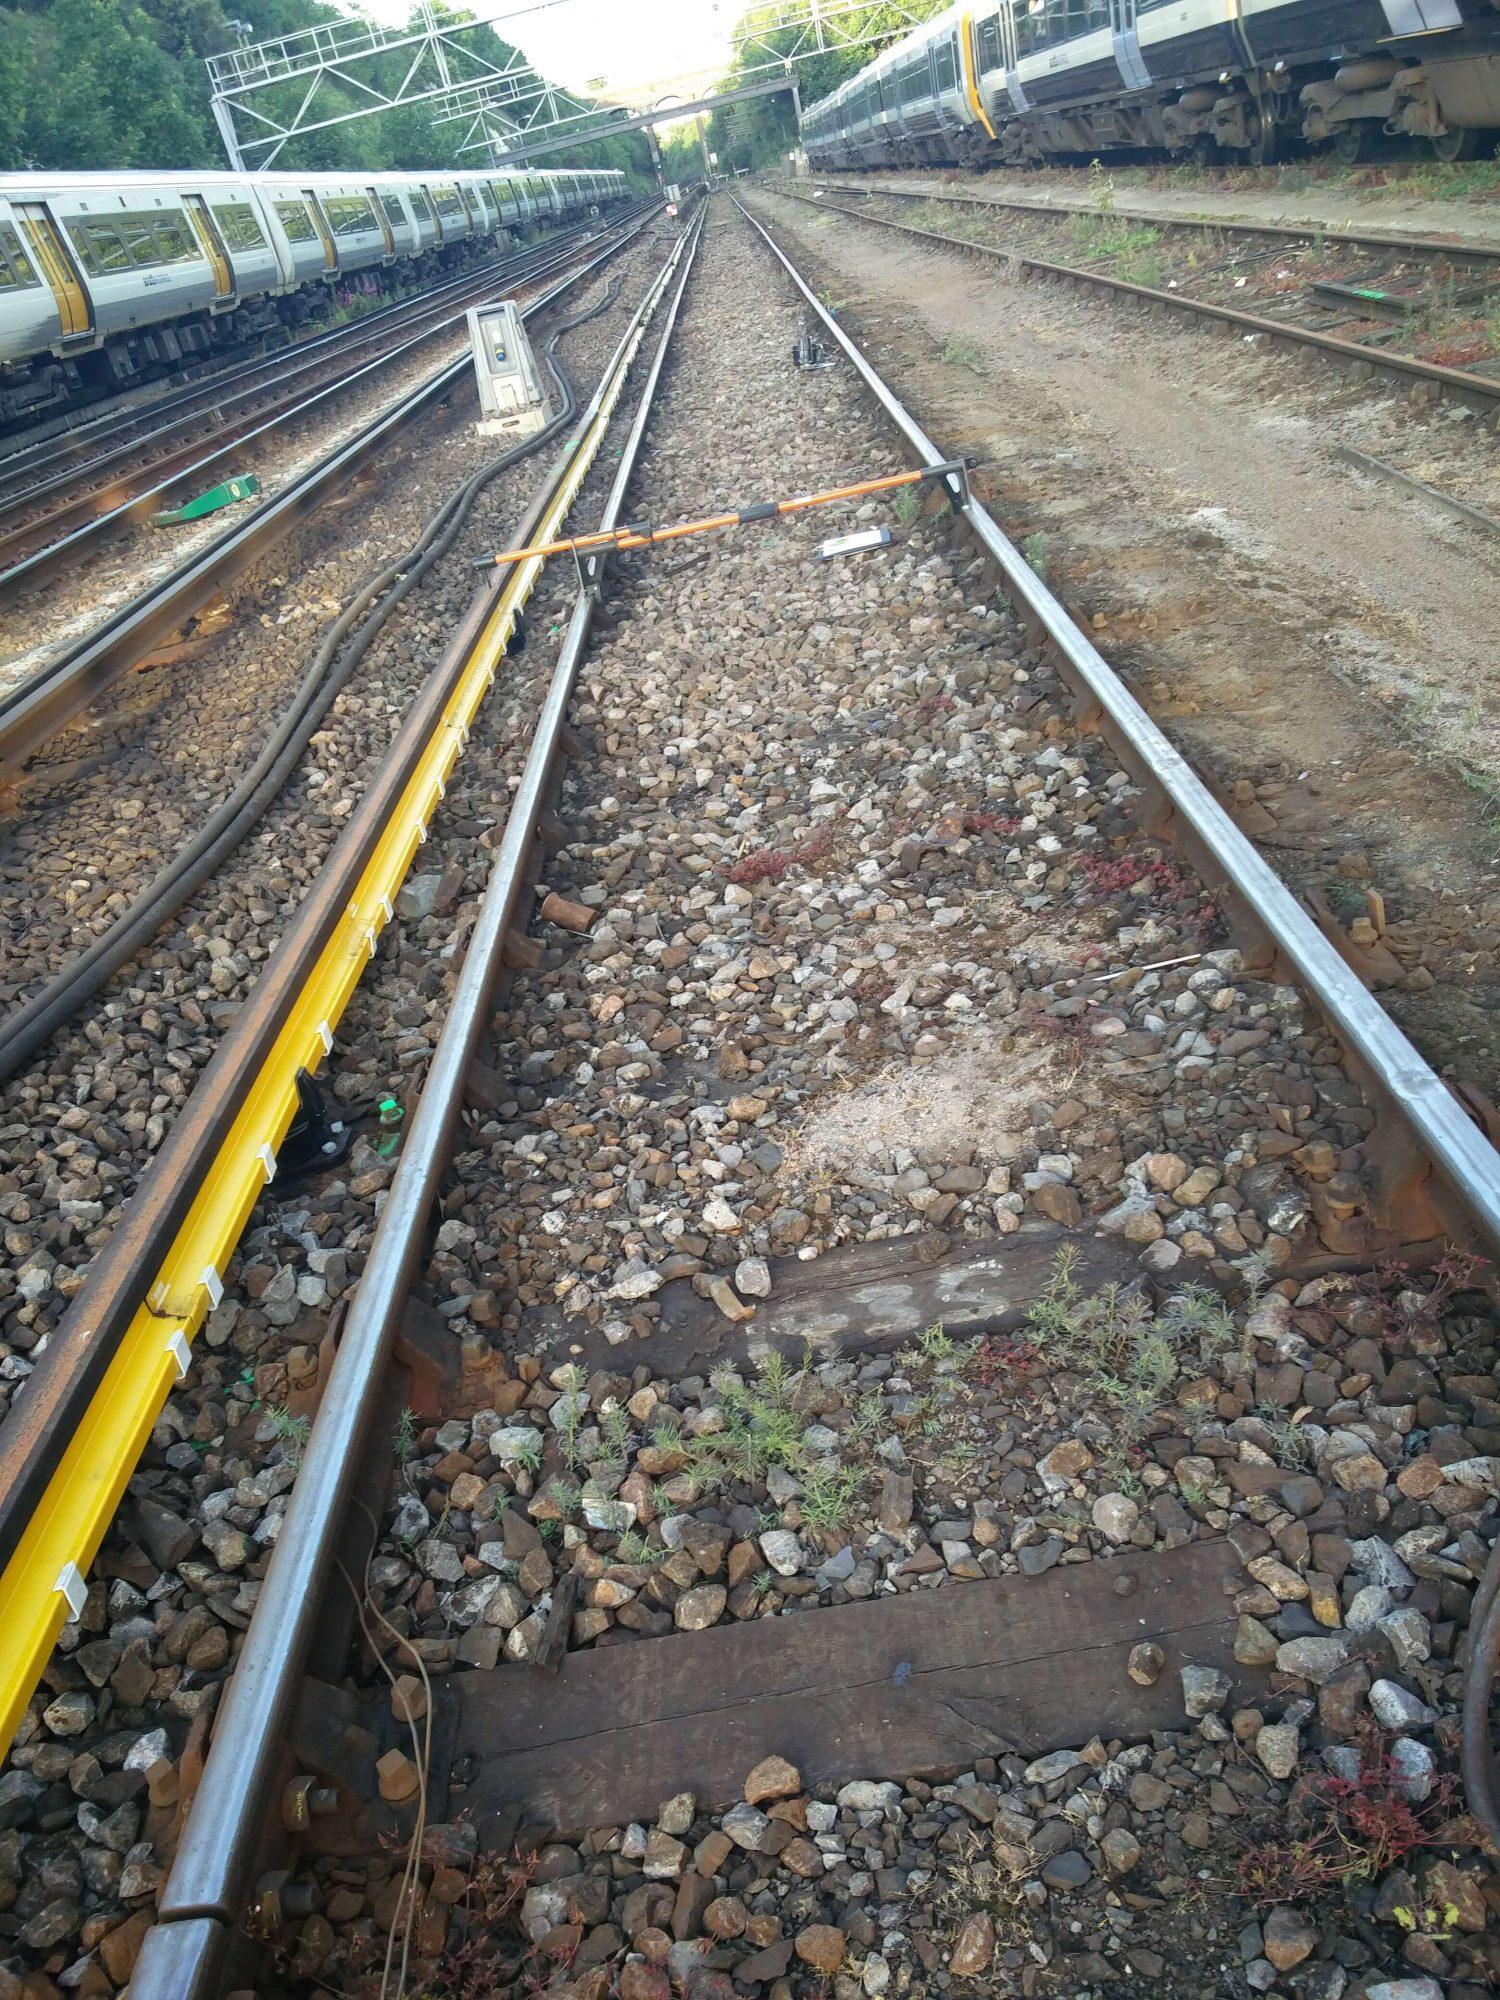 Conductor rail slew